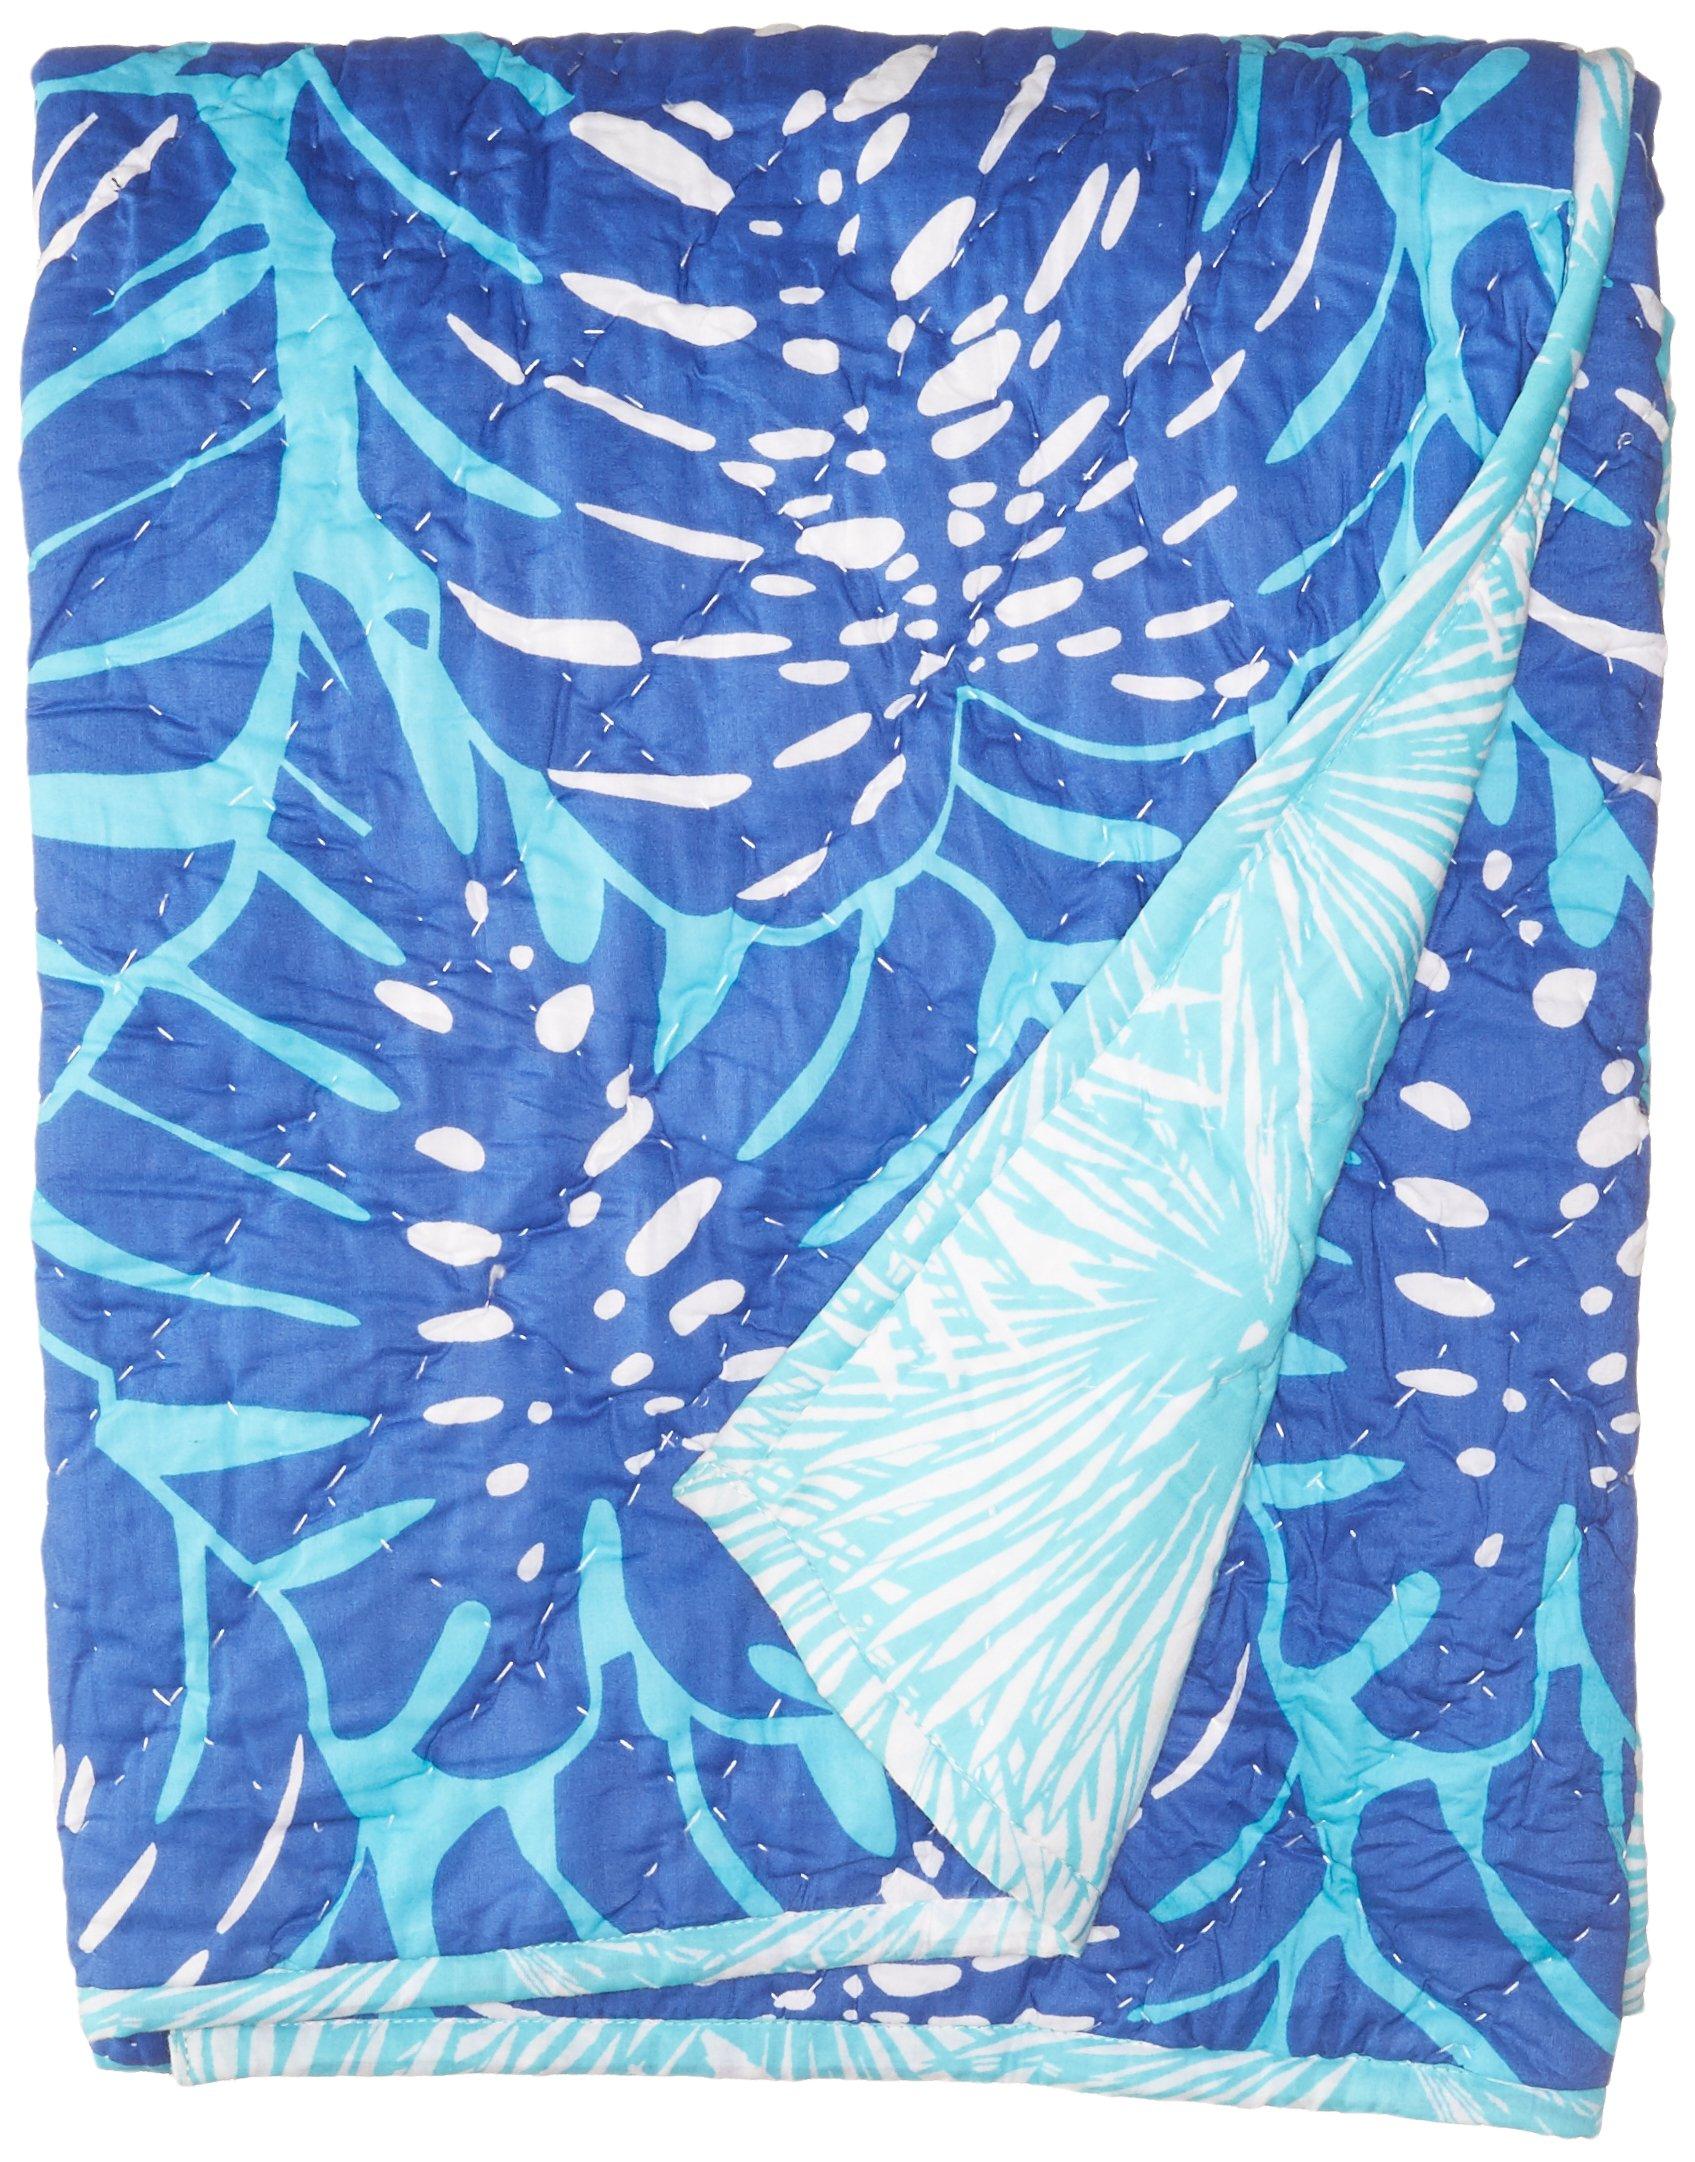 Masala Baby Baby Mokshareversible Quilt, Island Palm Navy, 40x60 by Masala Baby